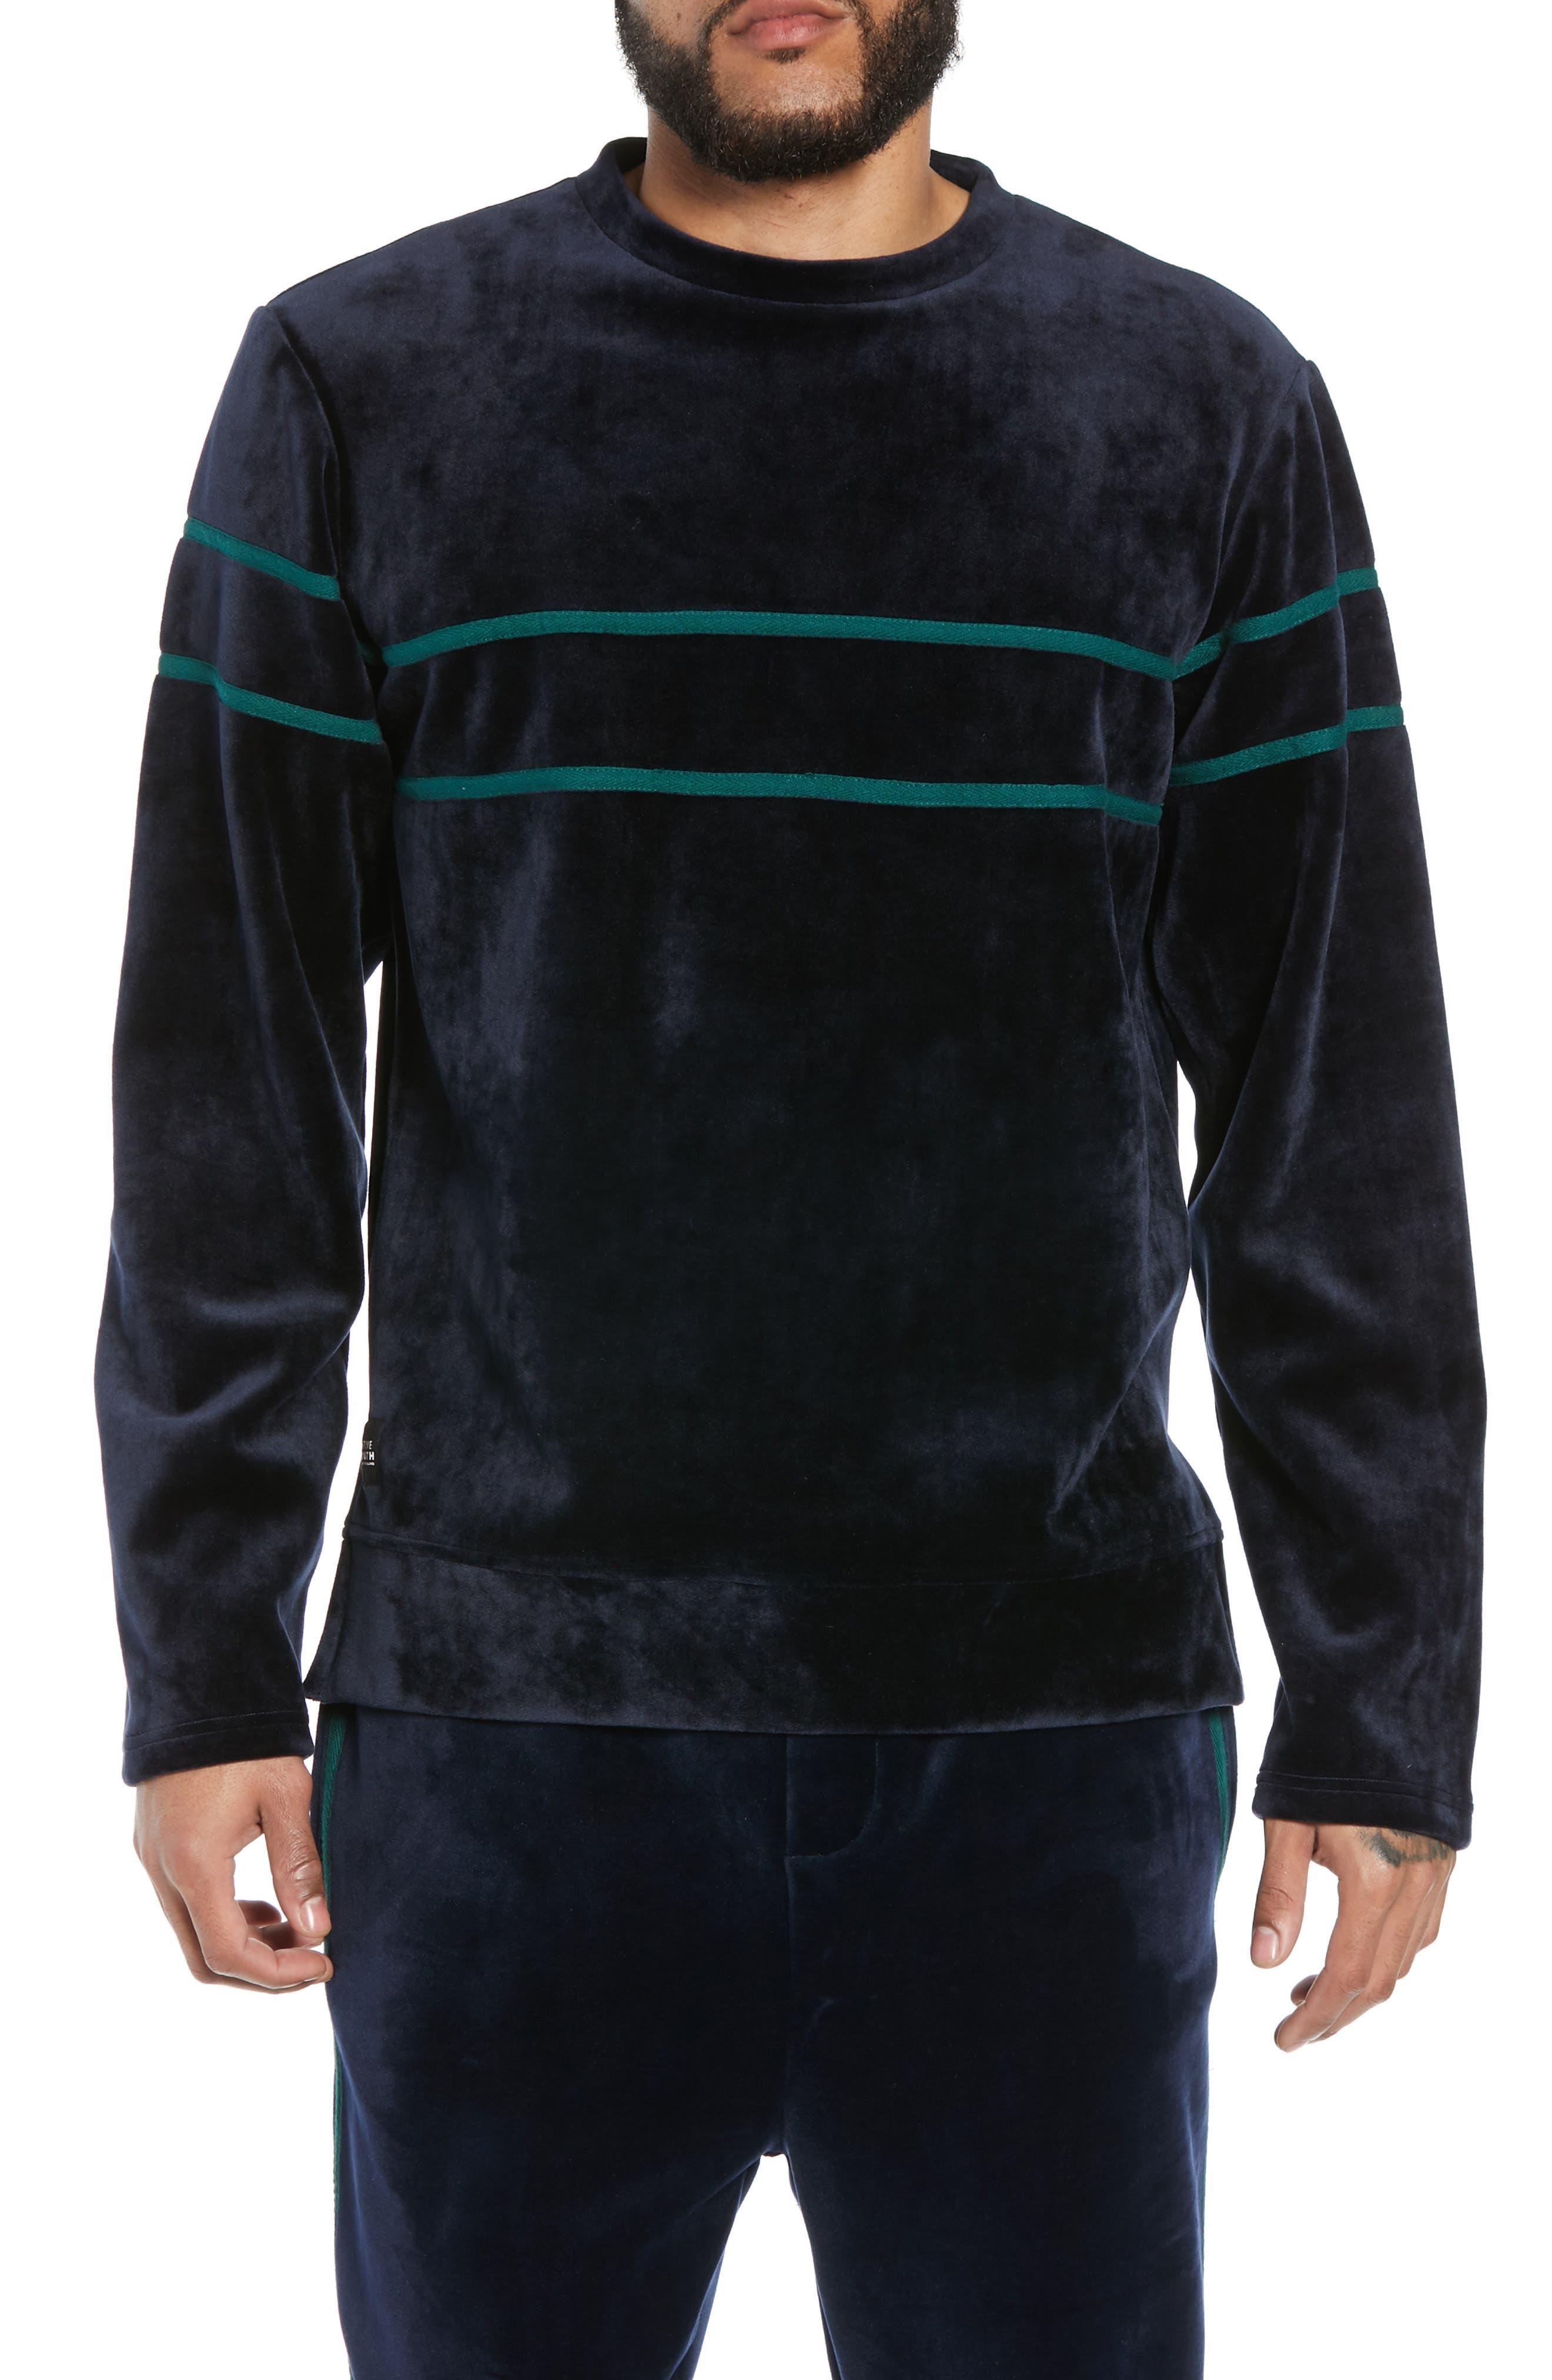 NATIVE YOUTH Stripe Velour Sweatshirt in Navy